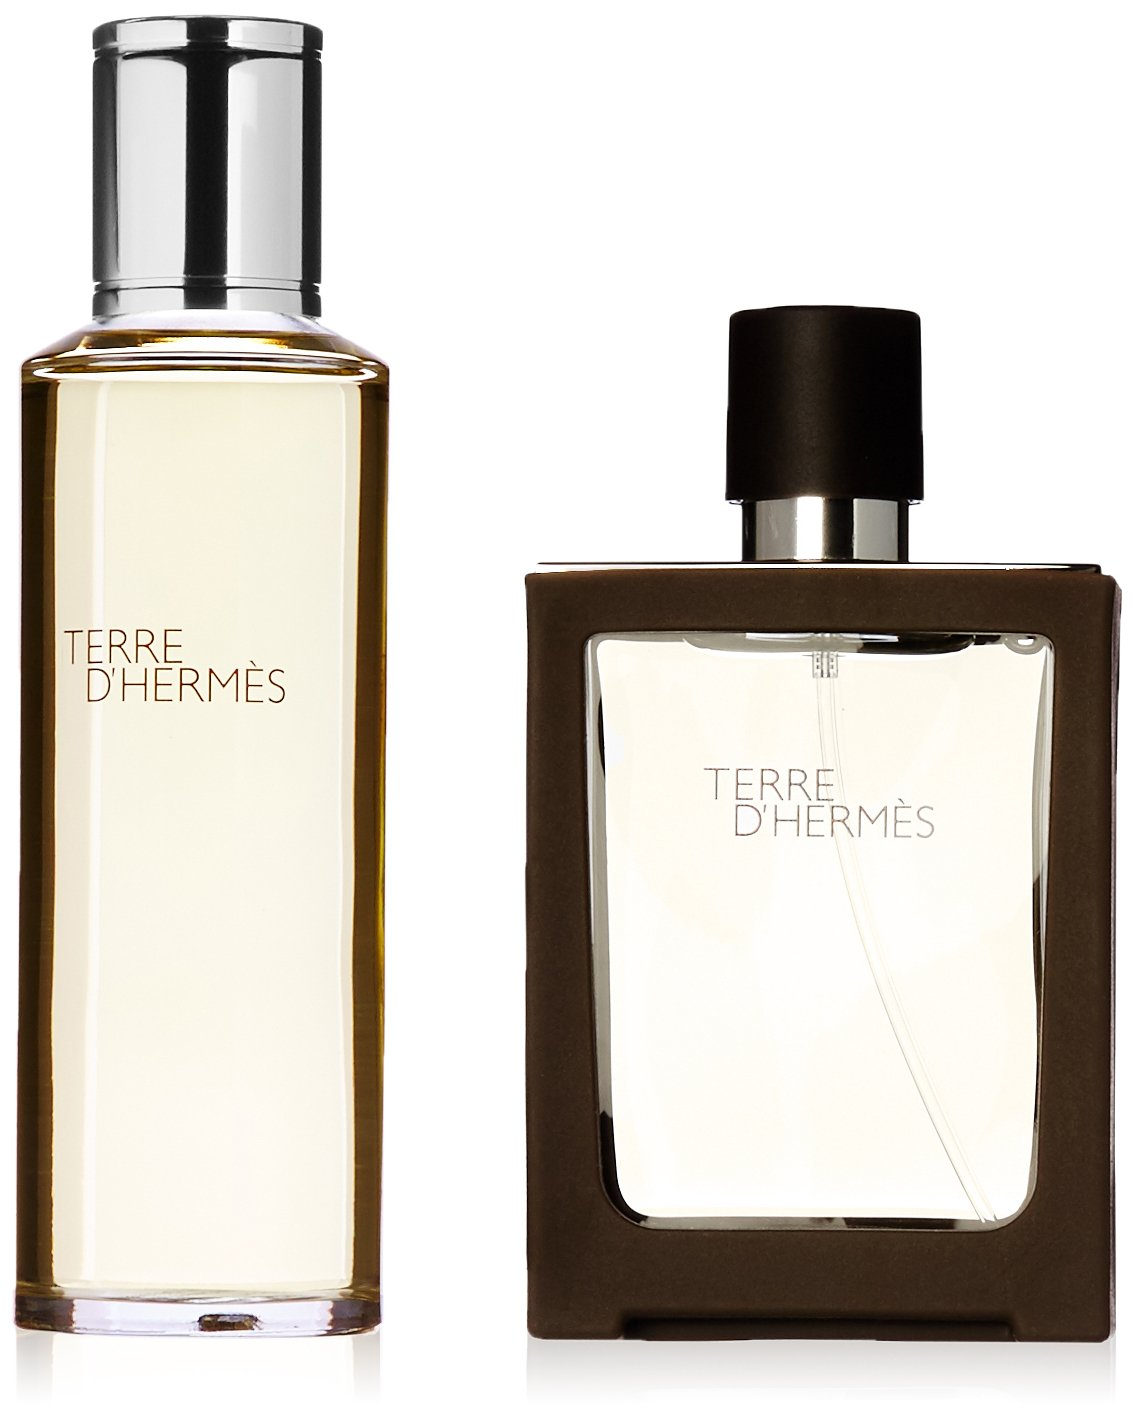 TERRE D'HERMES 125+30 ML TERRE D' HERMES 125+30 ML Hermès HERME26023